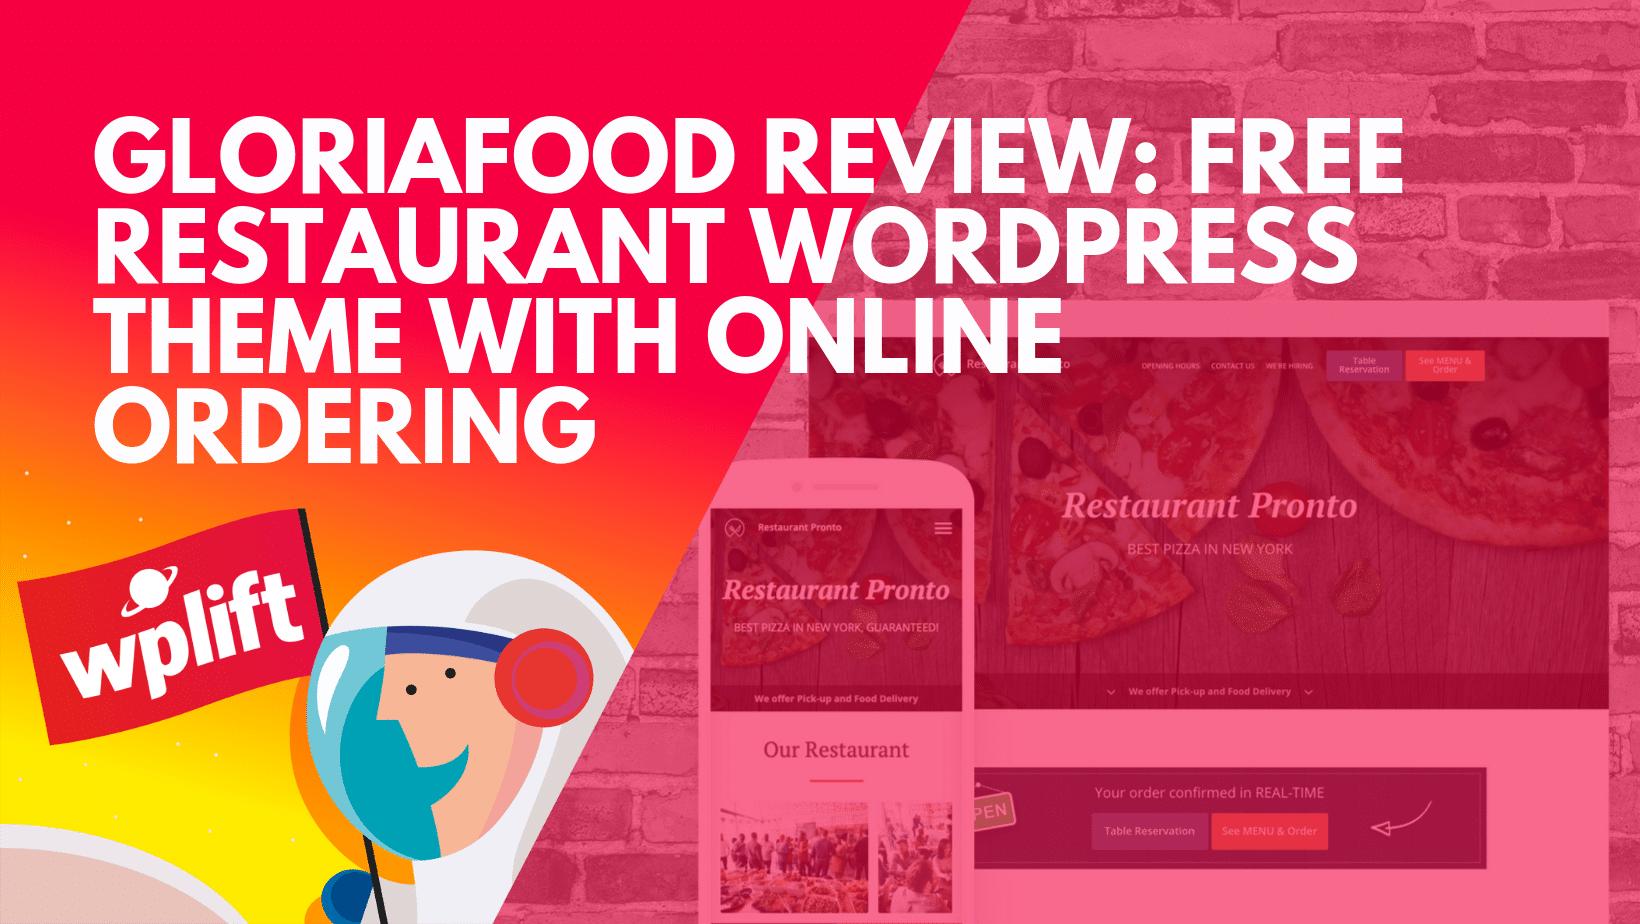 Free Restaurant WordPress Theme With Online Ordering